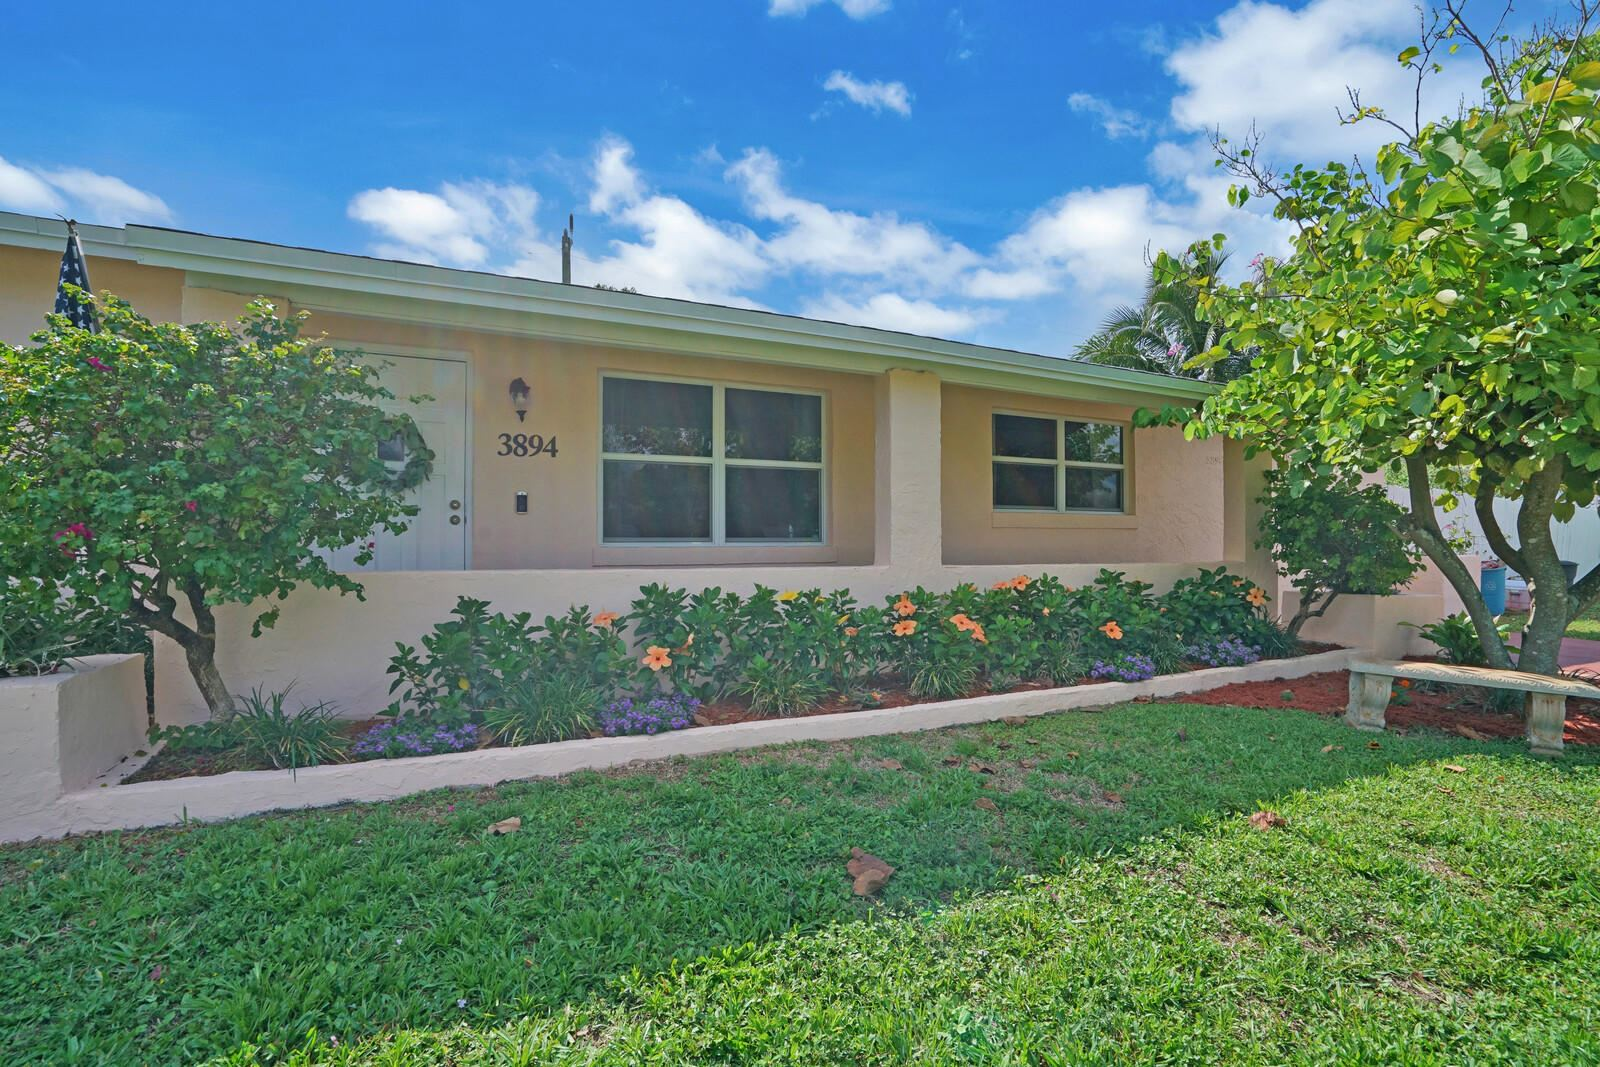 3894 Beverly Drive, Lake Worth, FL 33461 - MLS#: RX-10715587